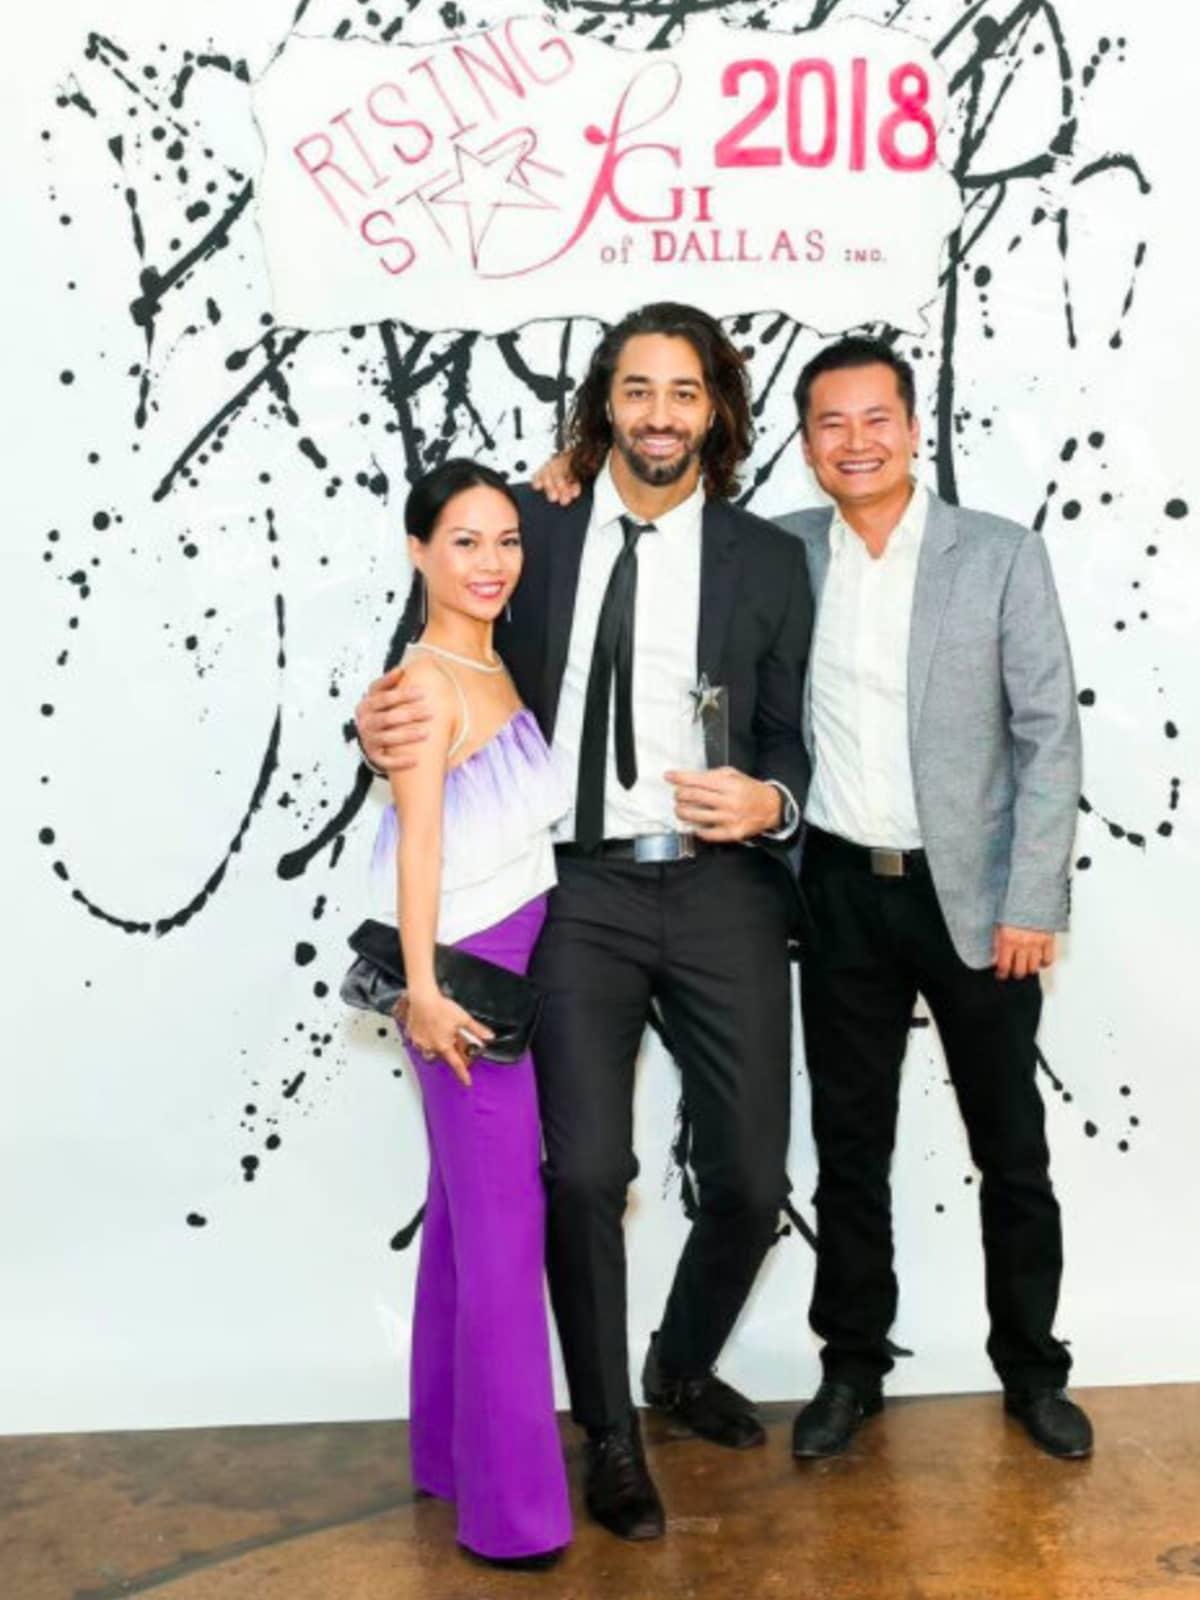 Nha-Khanh Nguyen, Aaron Fairooz, Loi Dang, Dallas_FGI Rising Star